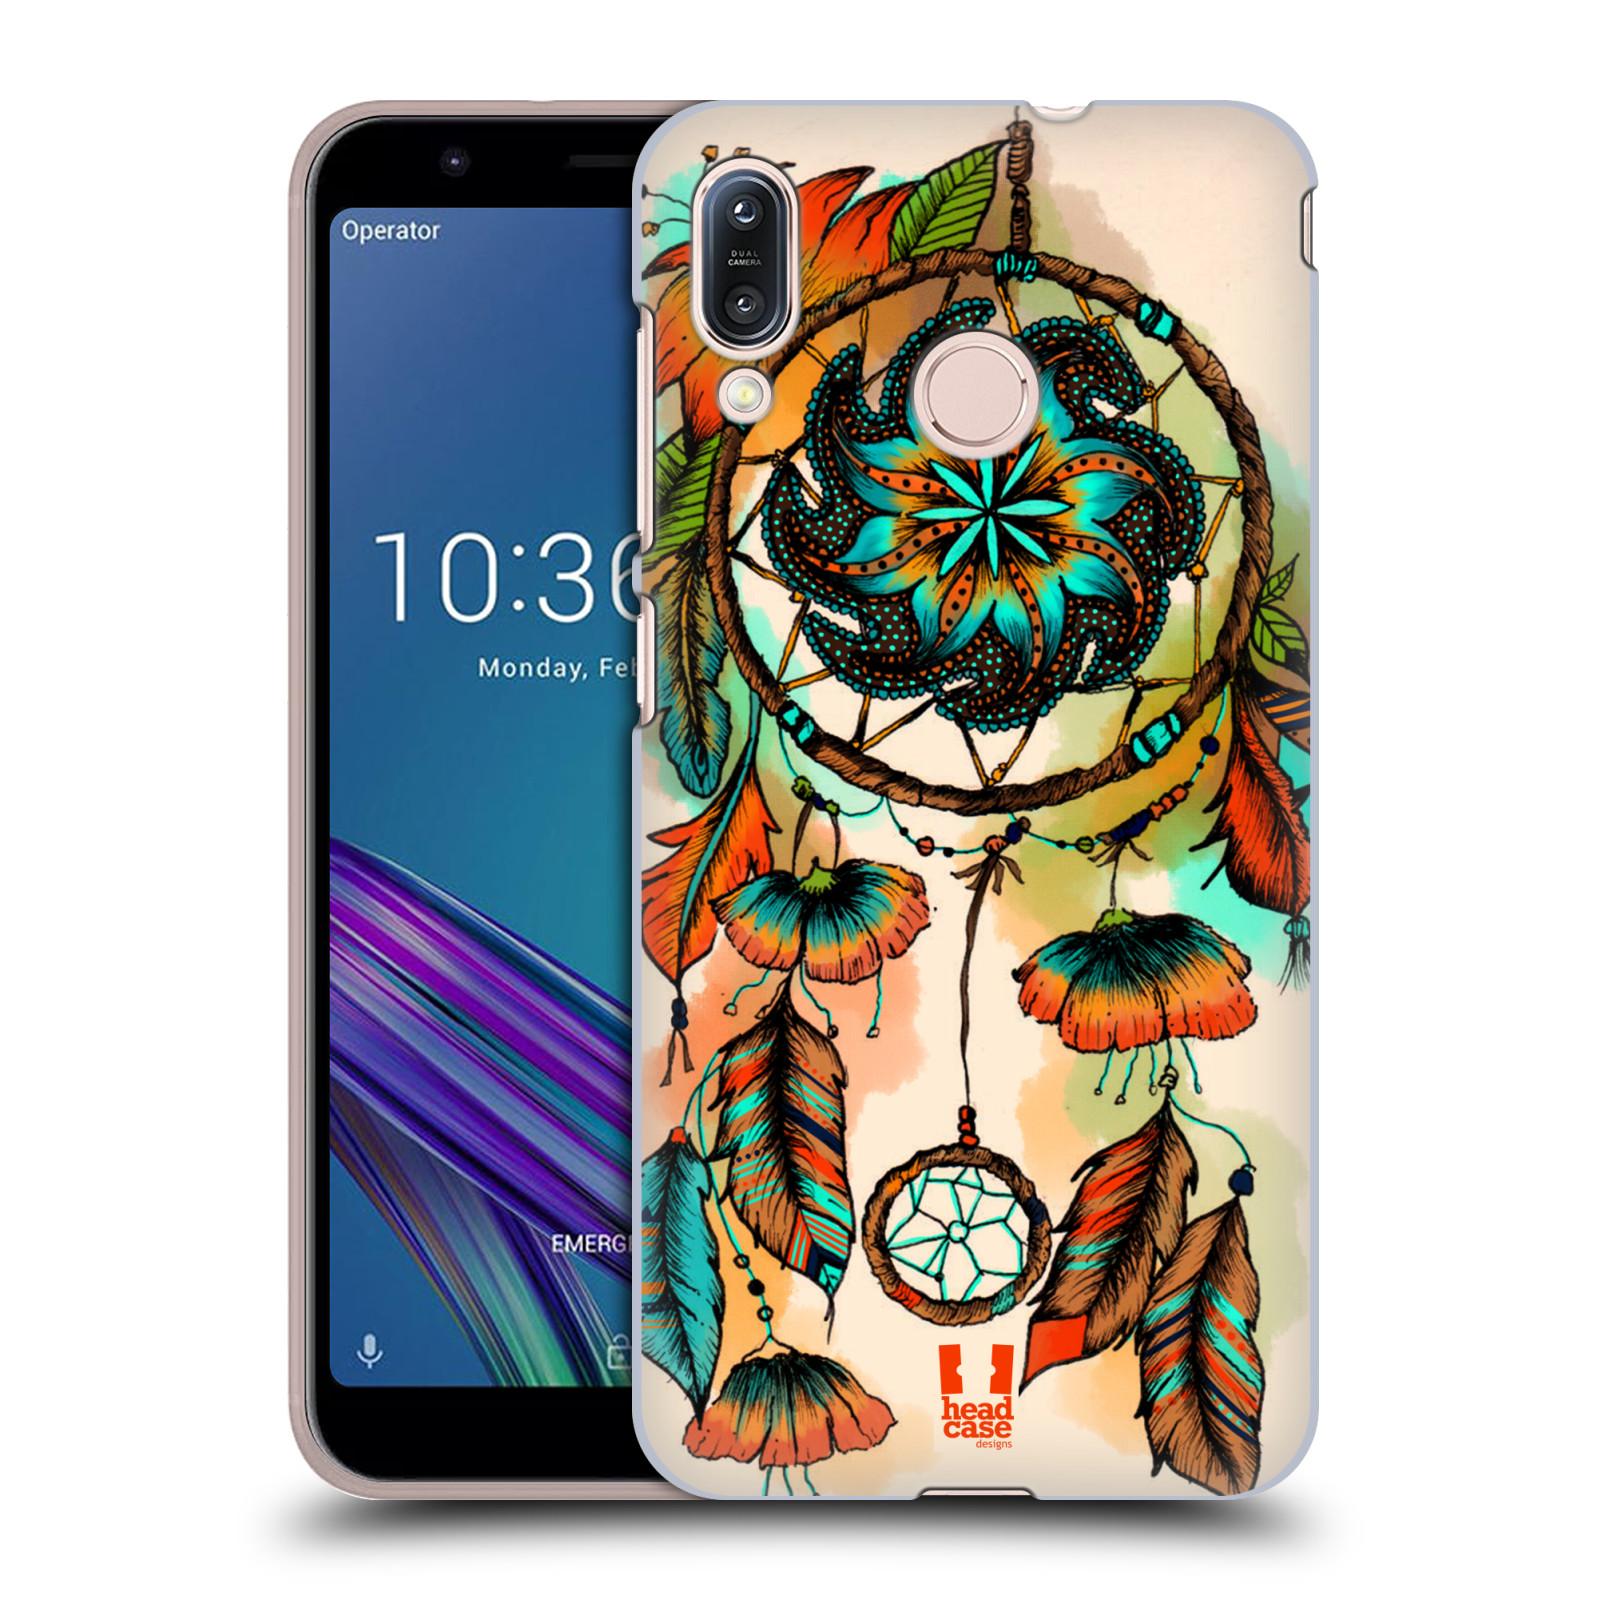 Plastové pouzdro na mobil Asus Zenfone Max M1 ZB555KL - Head Case - BLOOM APRICOT